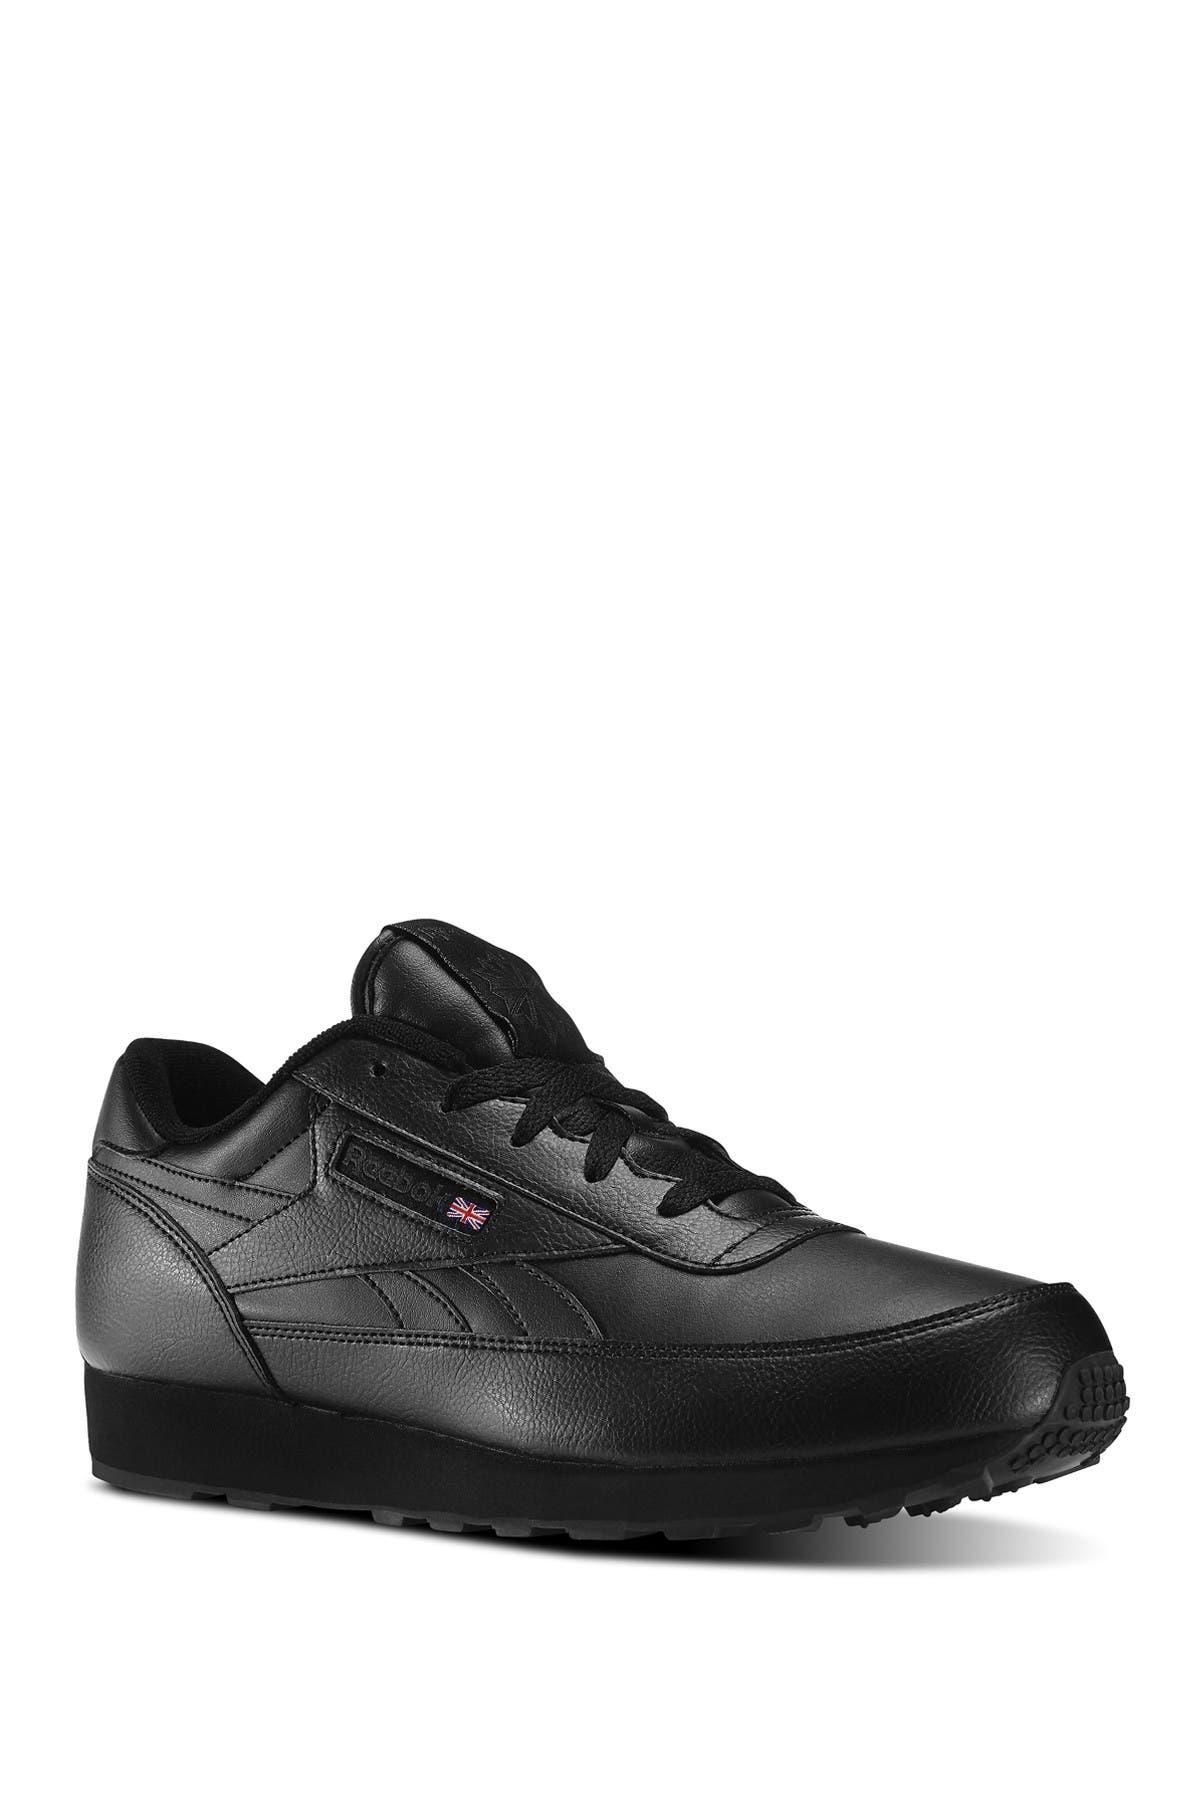 Image of Reebok CL Renaissance 4E Sneaker - Extra Wide Width